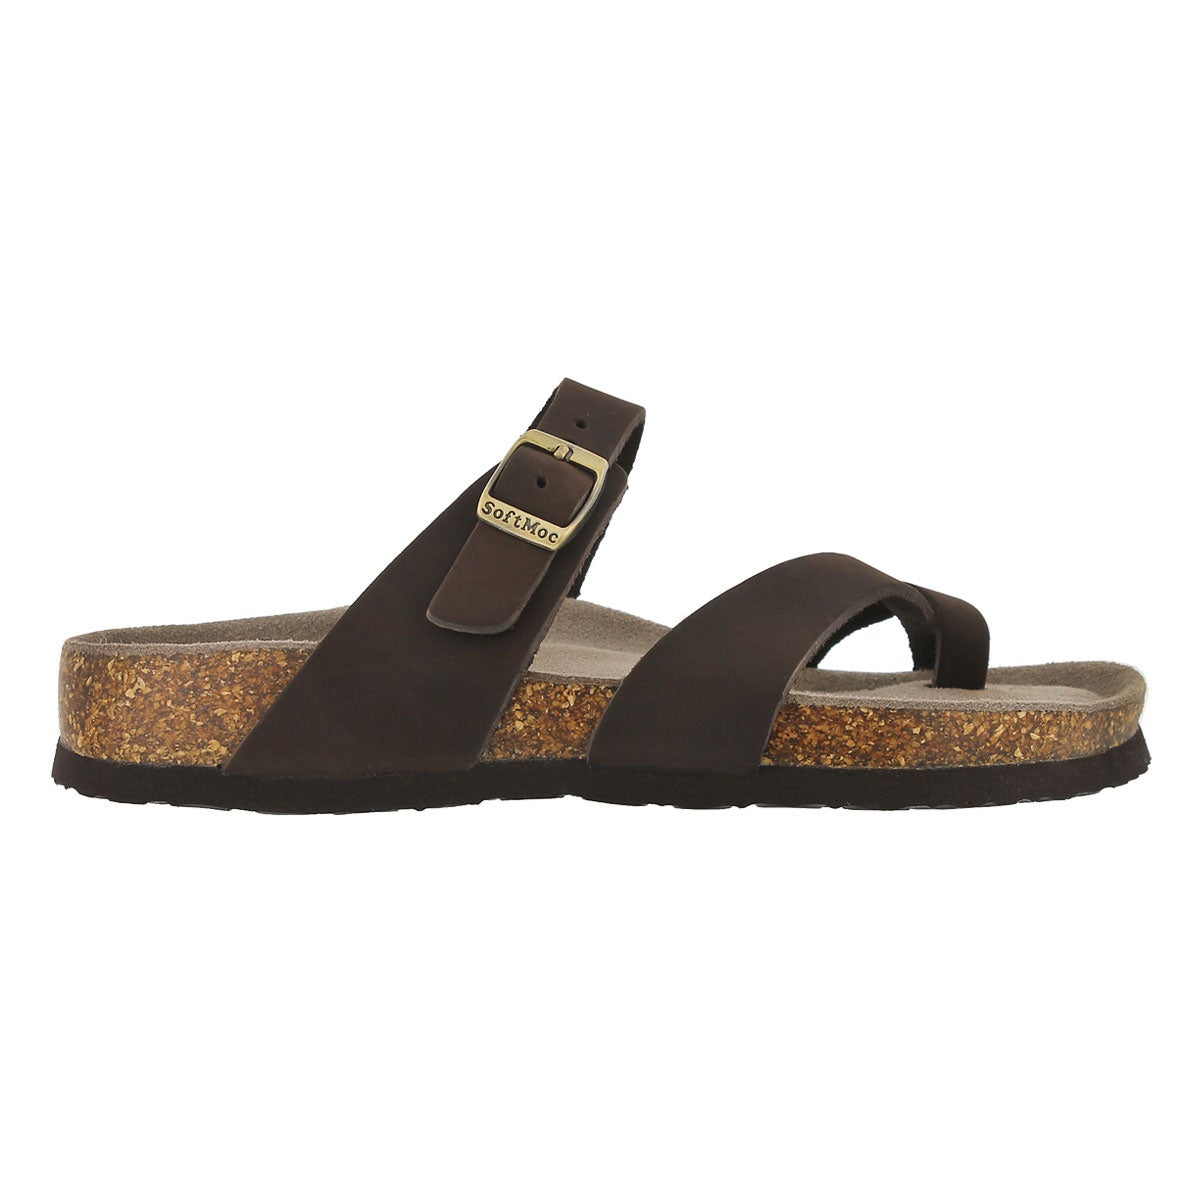 Lds Alicia 3 brn crz memory foam sandal